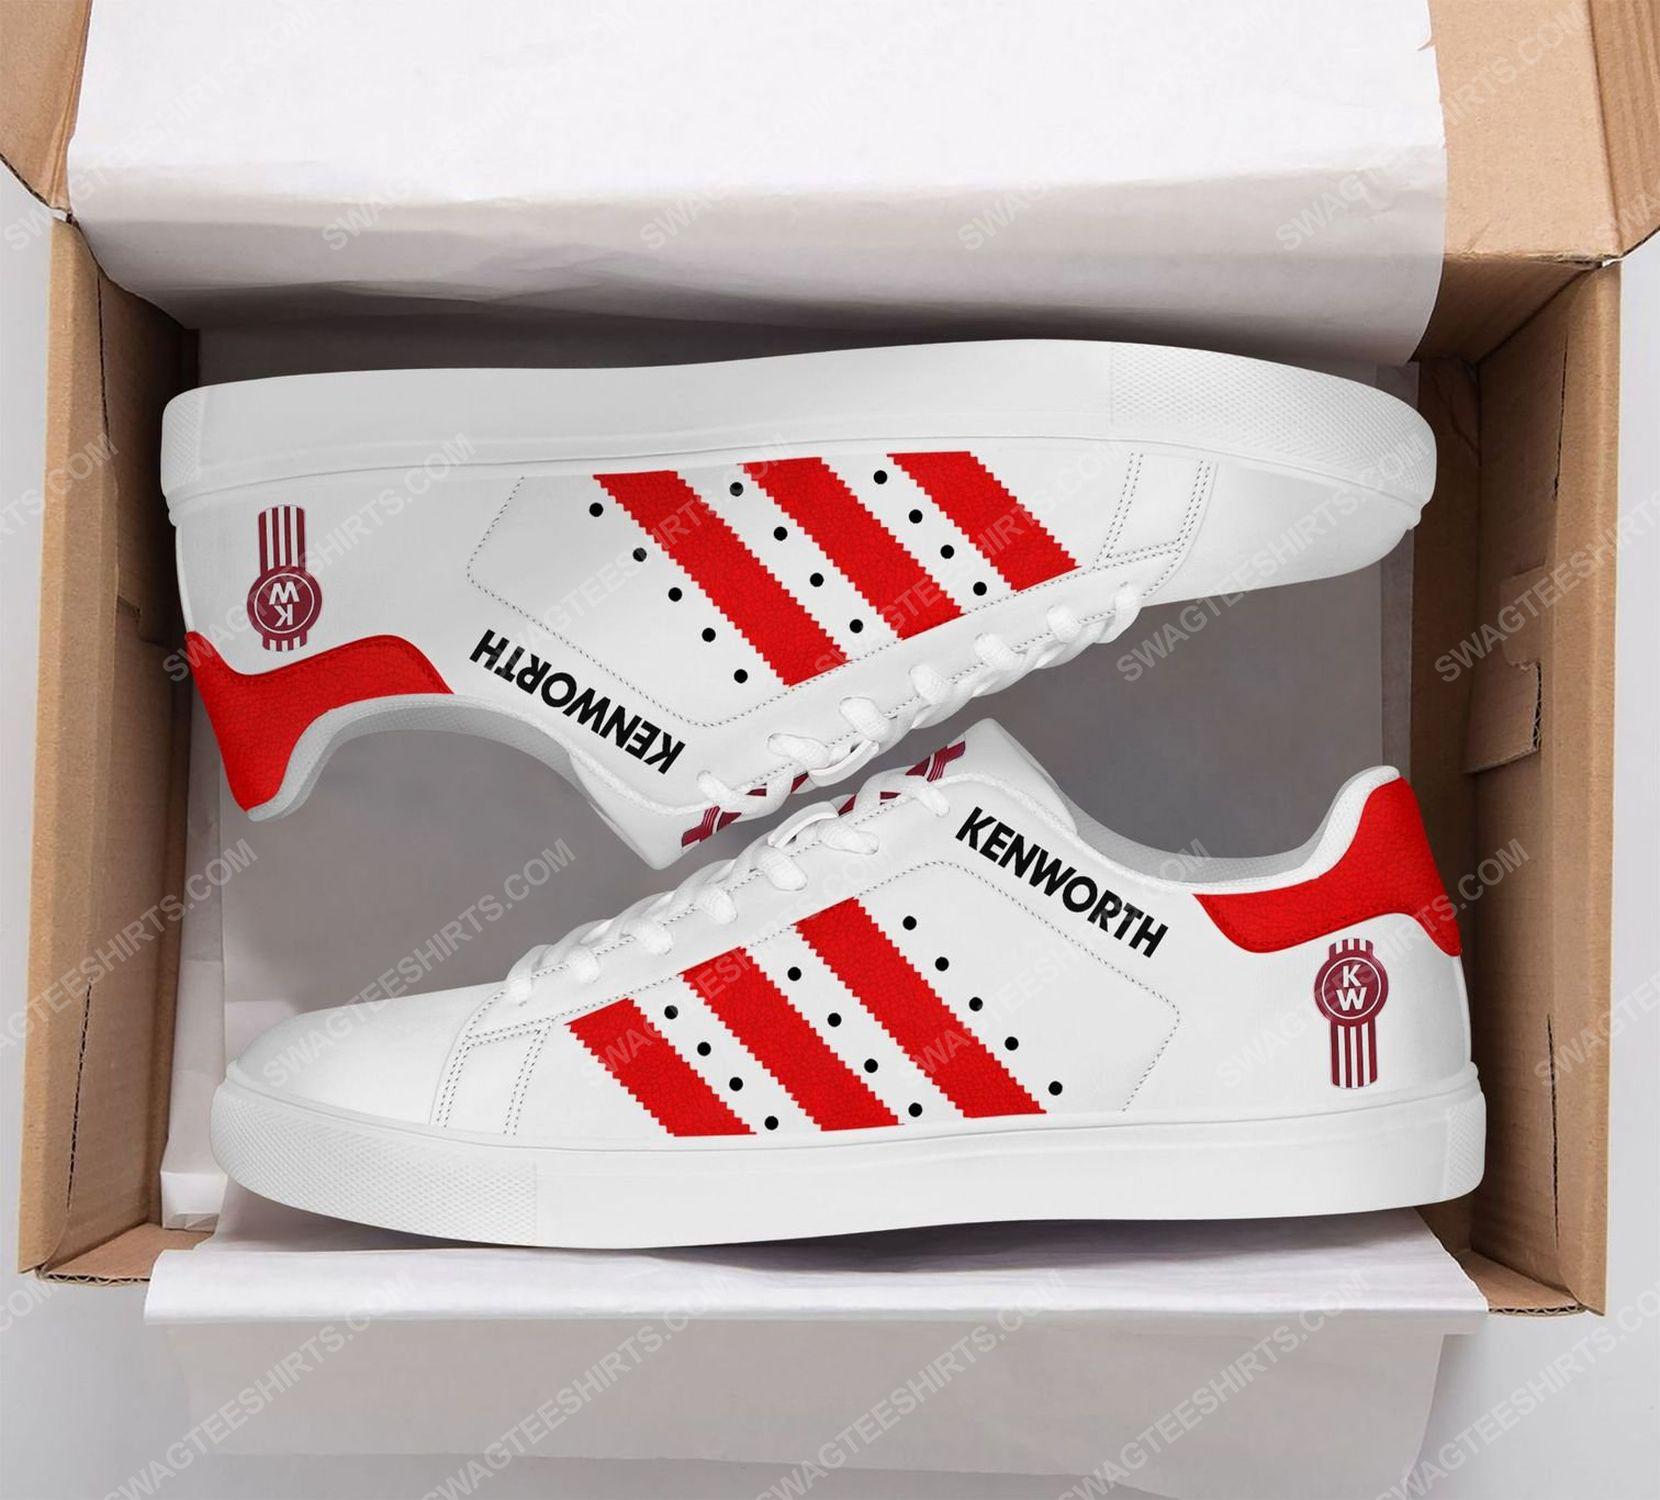 Kenworth trucks version red stan smith shoes 2